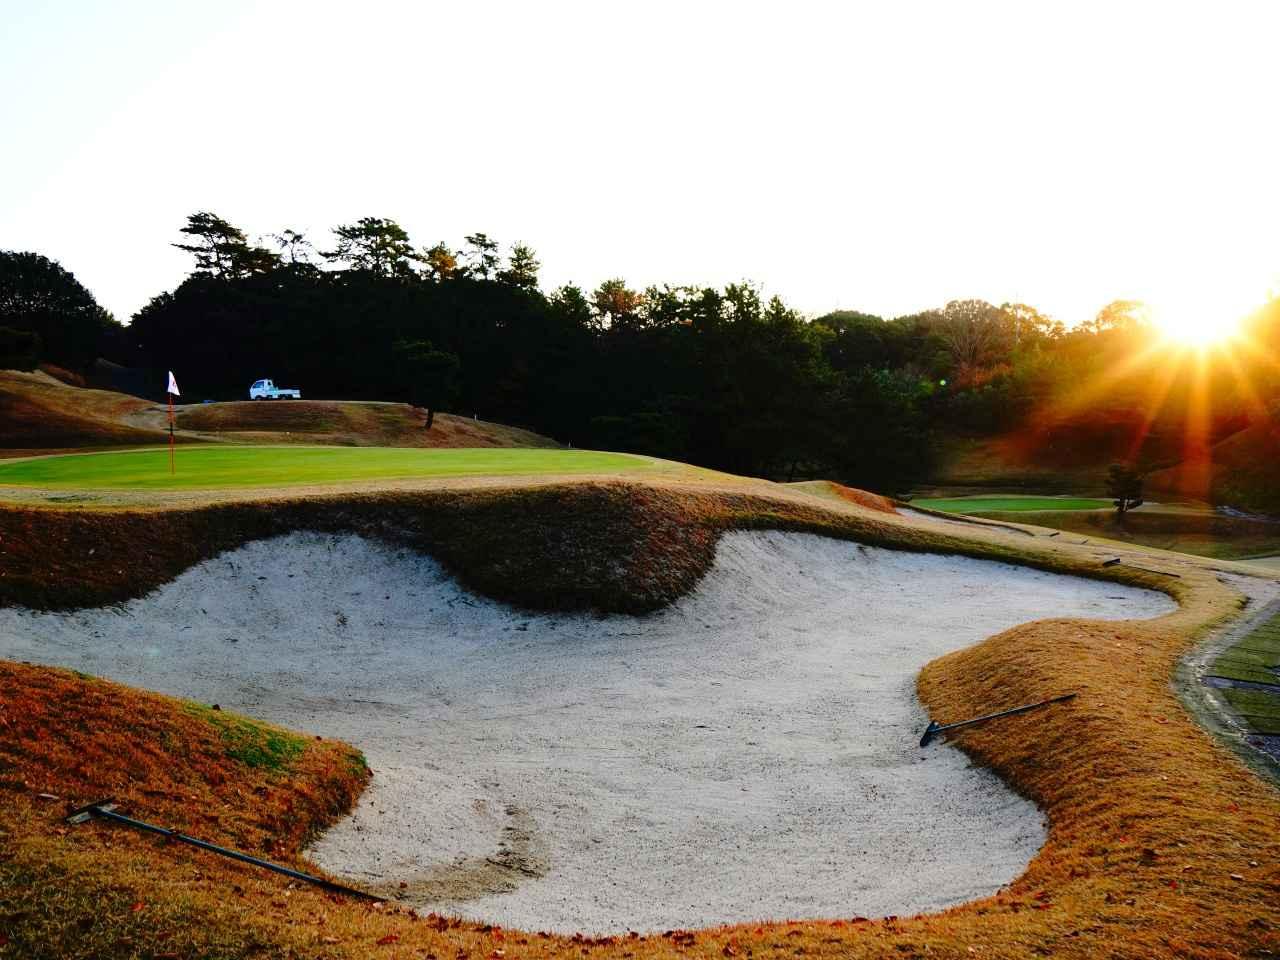 Images : 4番目の画像 - 垂水ゴルフ倶楽部 - ゴルフへ行こうWEB by ゴルフダイジェスト